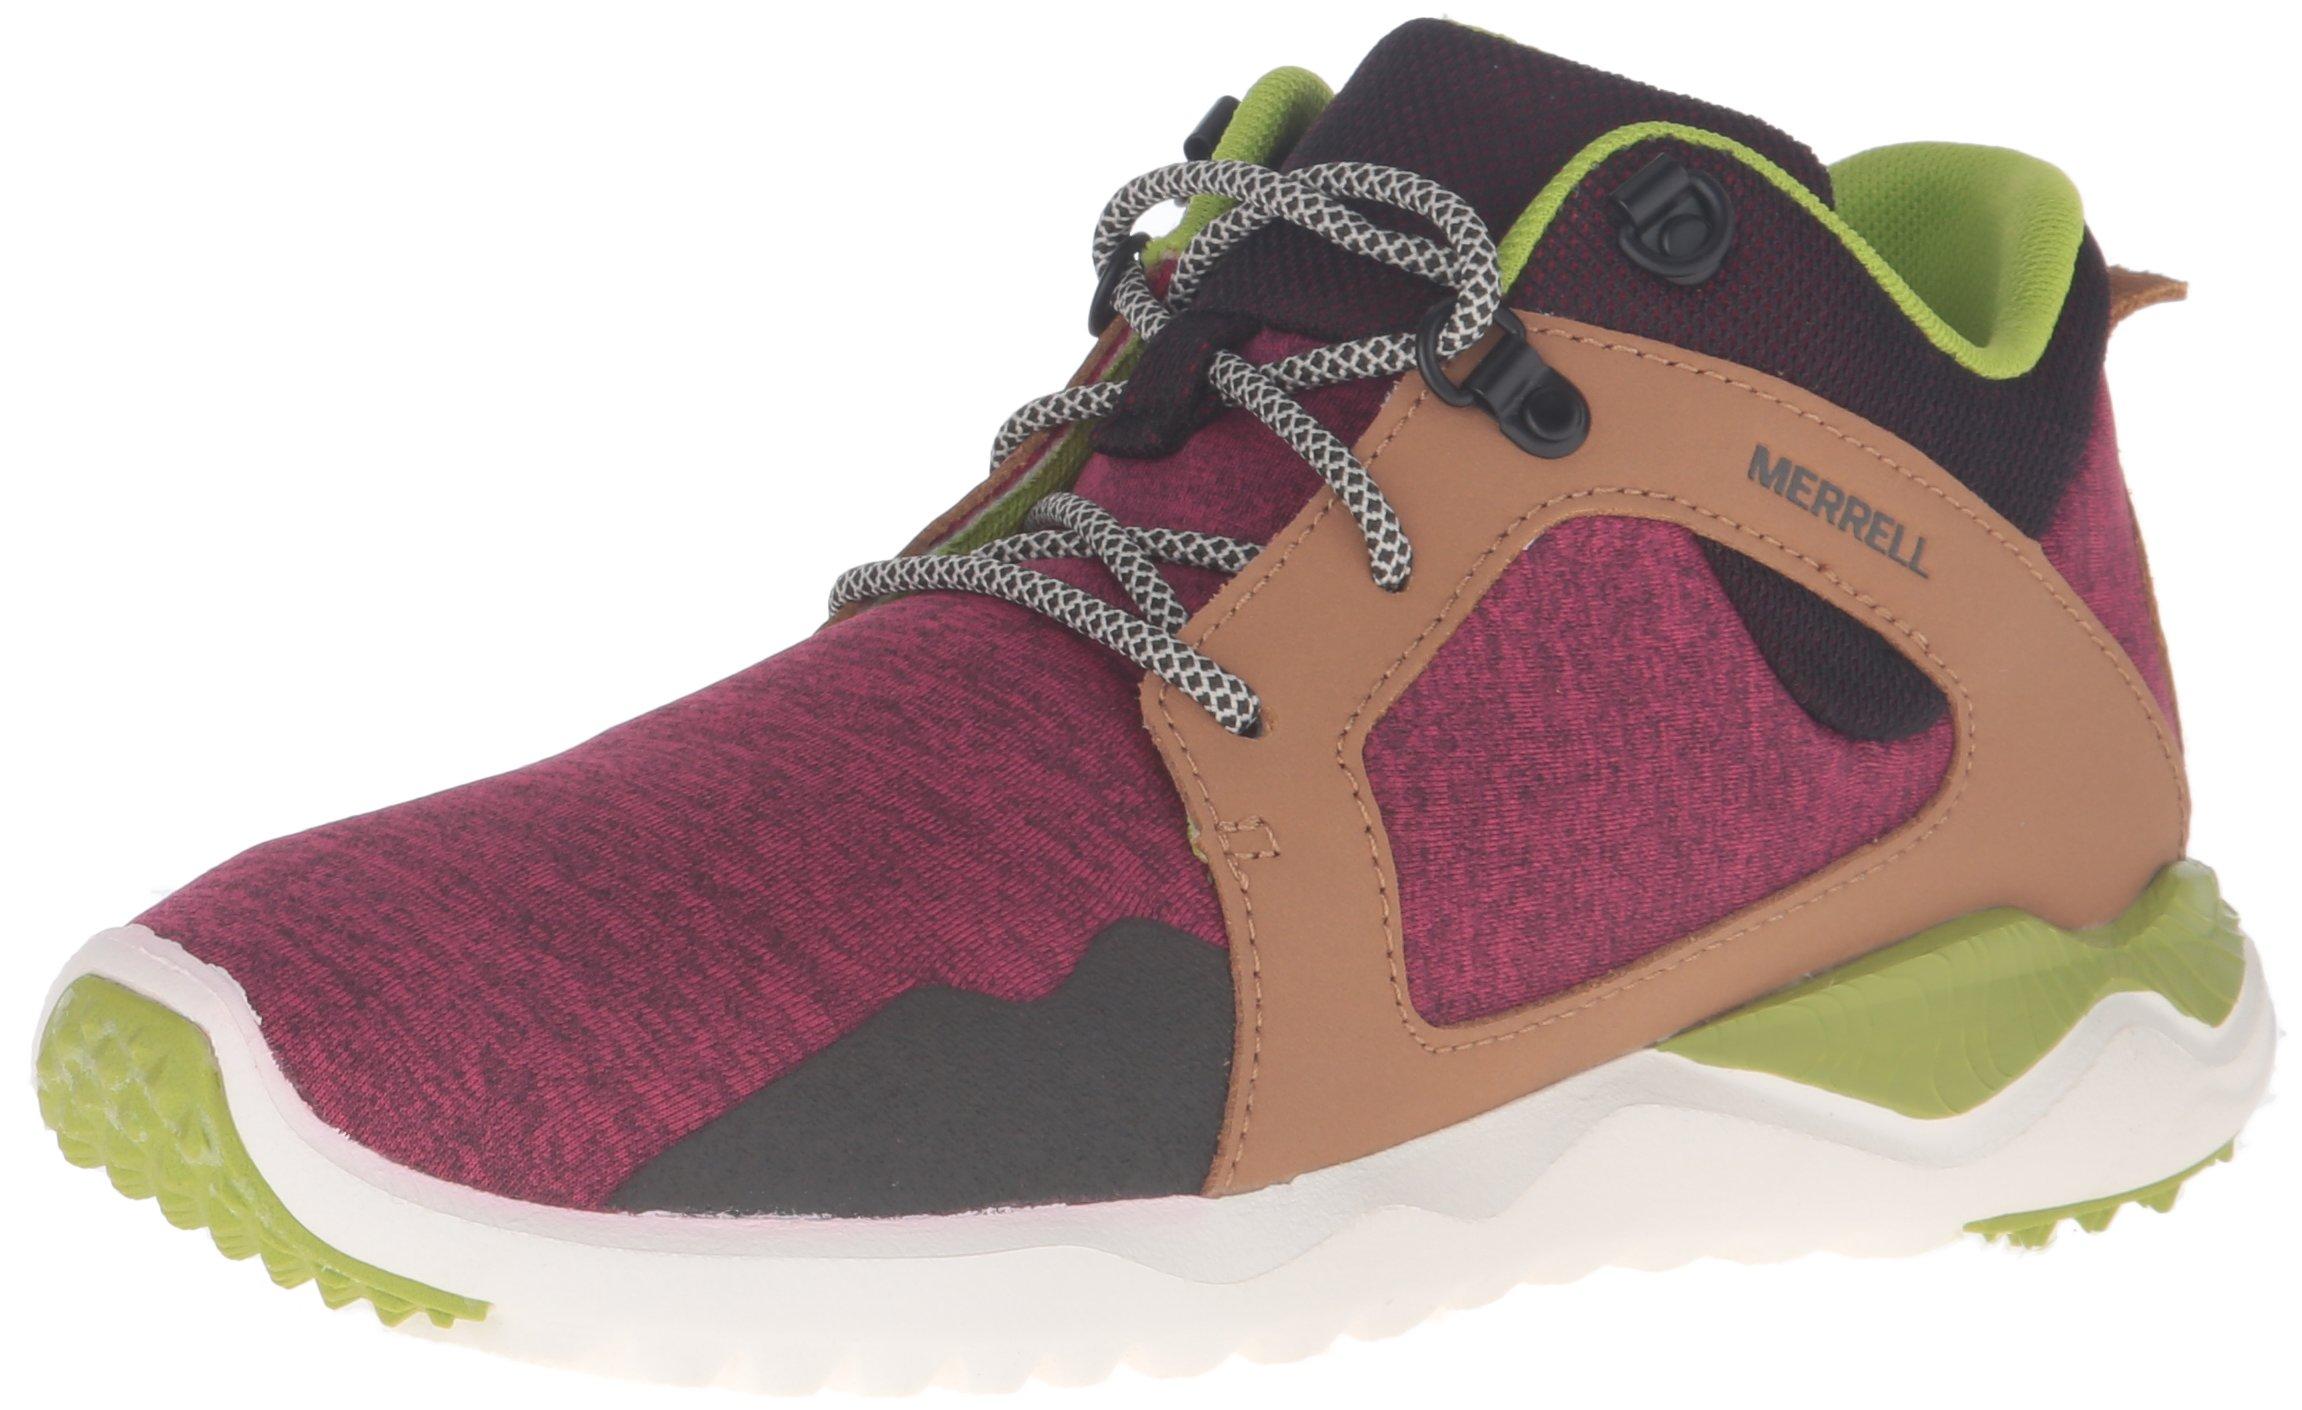 Merrell Women's 1SIX8 Mid Boot, Jazzy, 10 M US